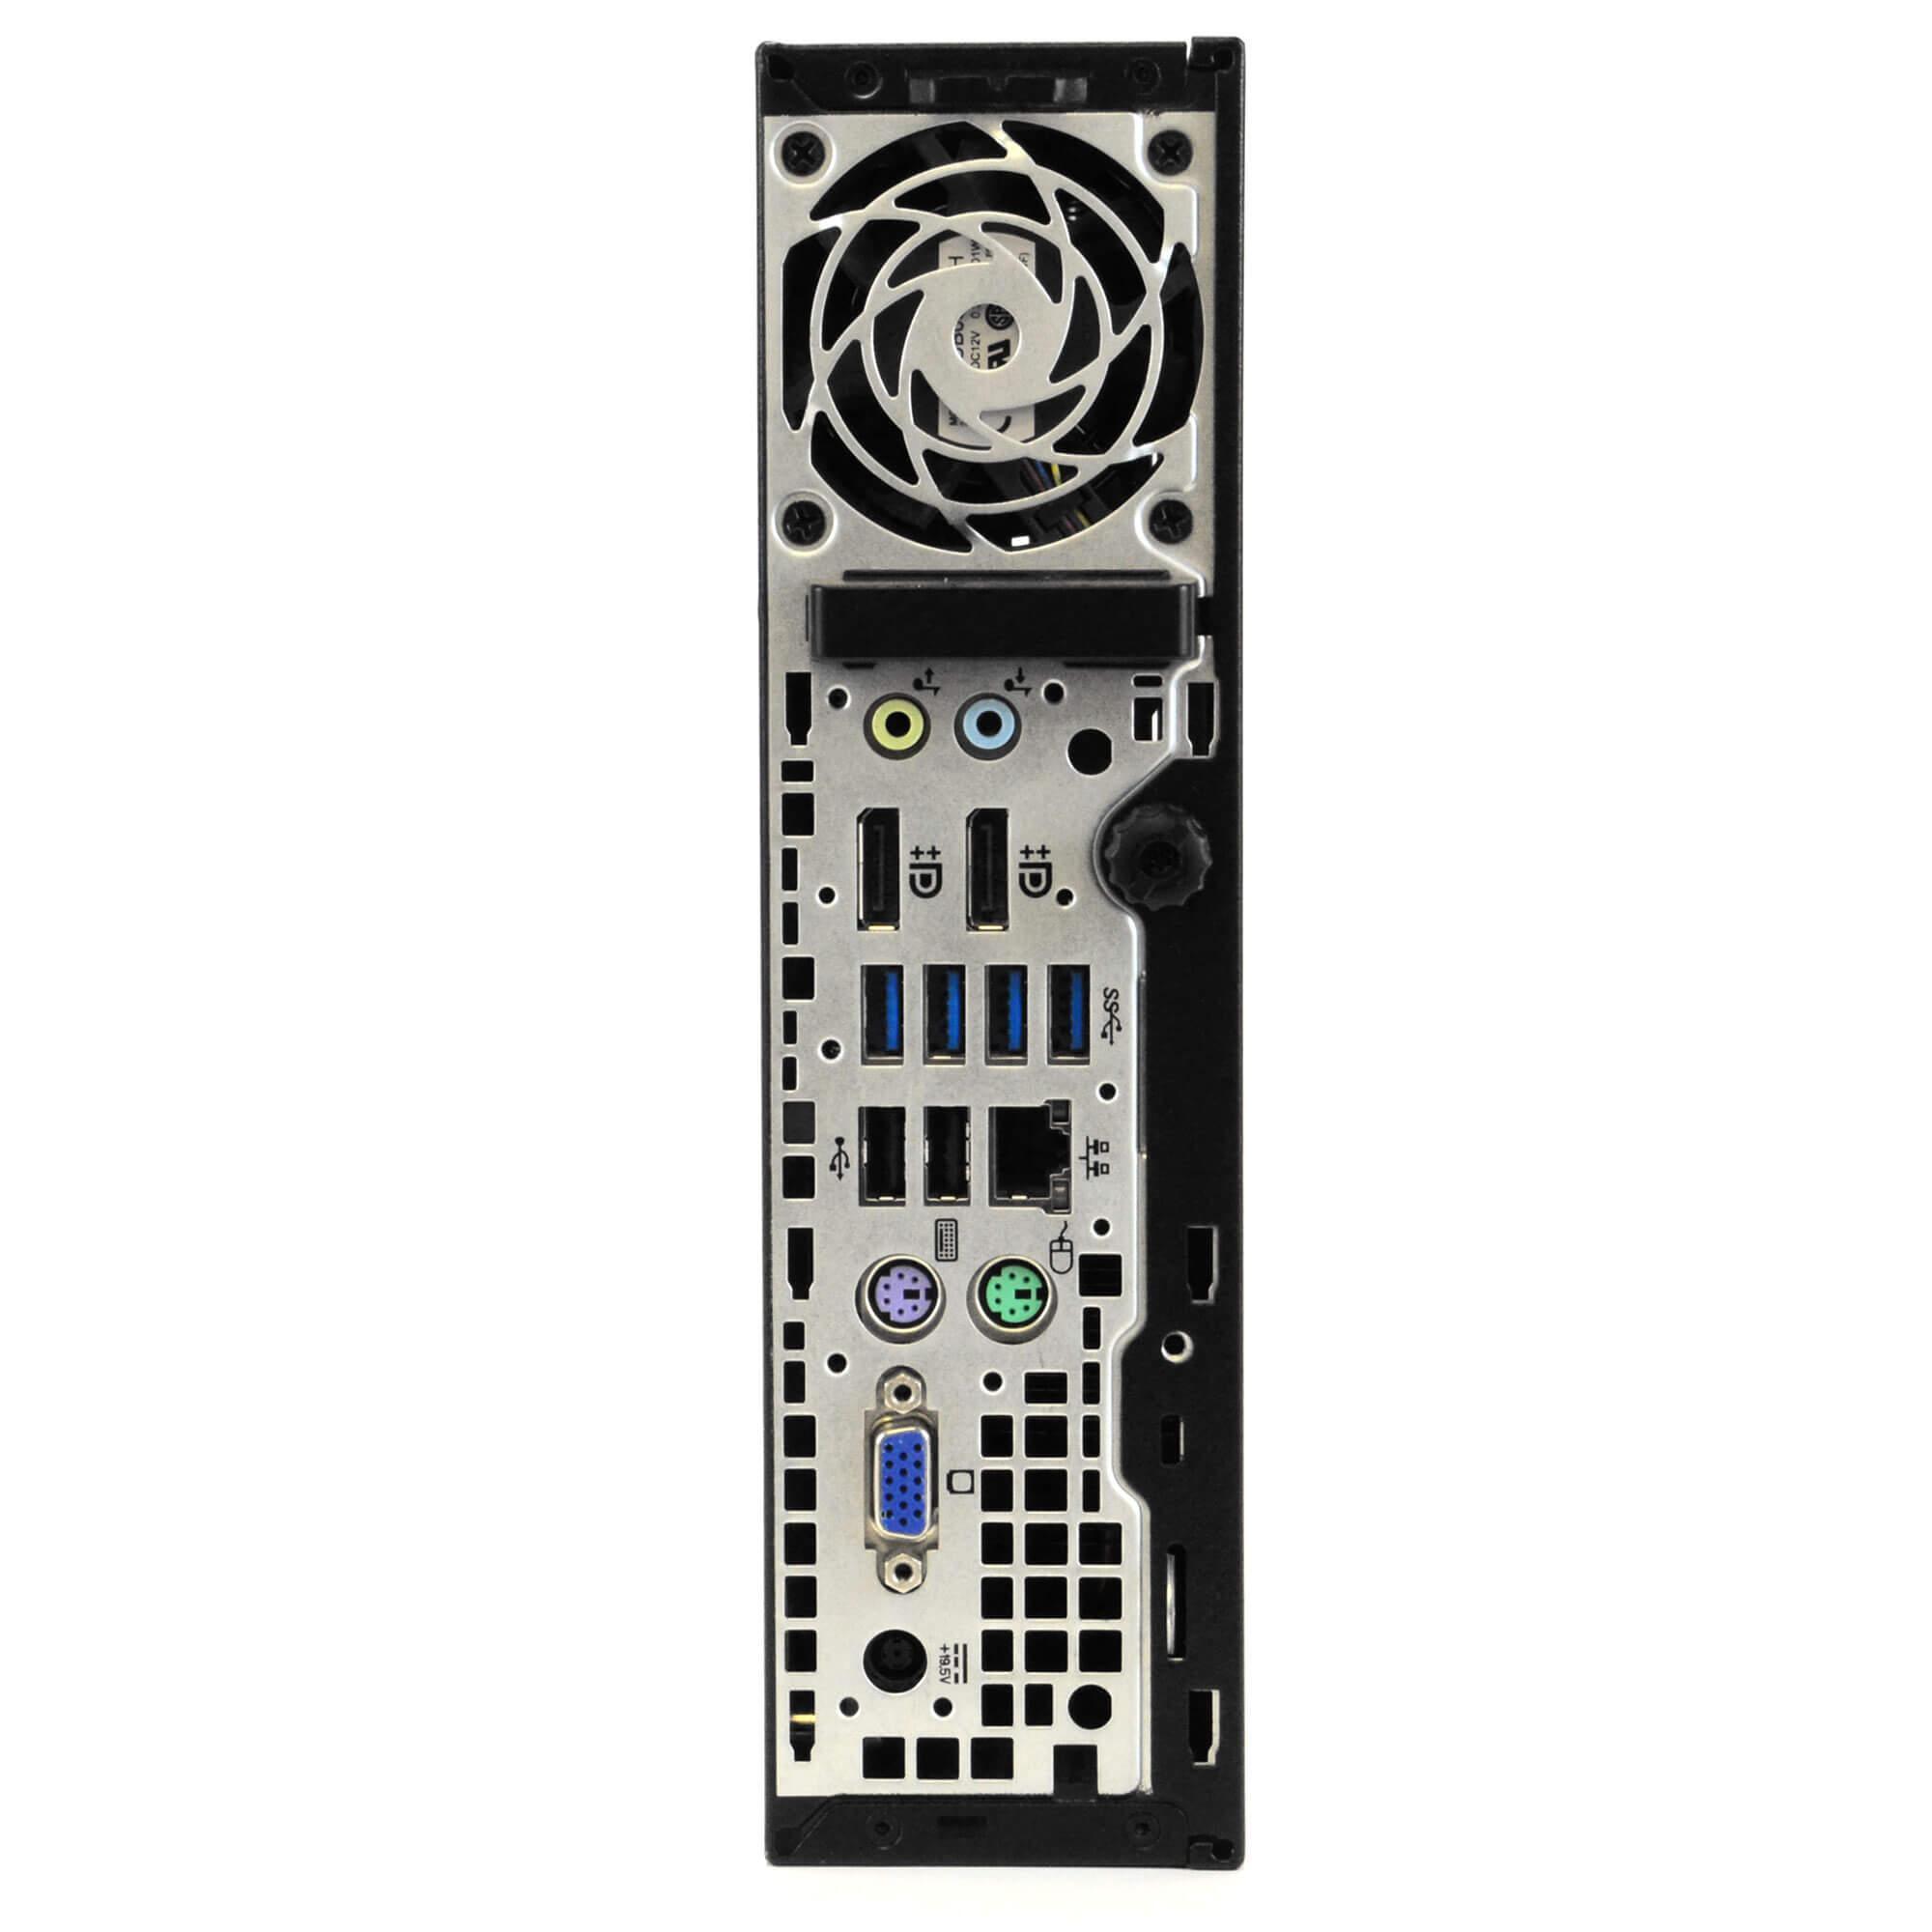 Hp Compaq Elite 8300 Core i5 2.9 GHz - HDD 500 GB RAM 4GB